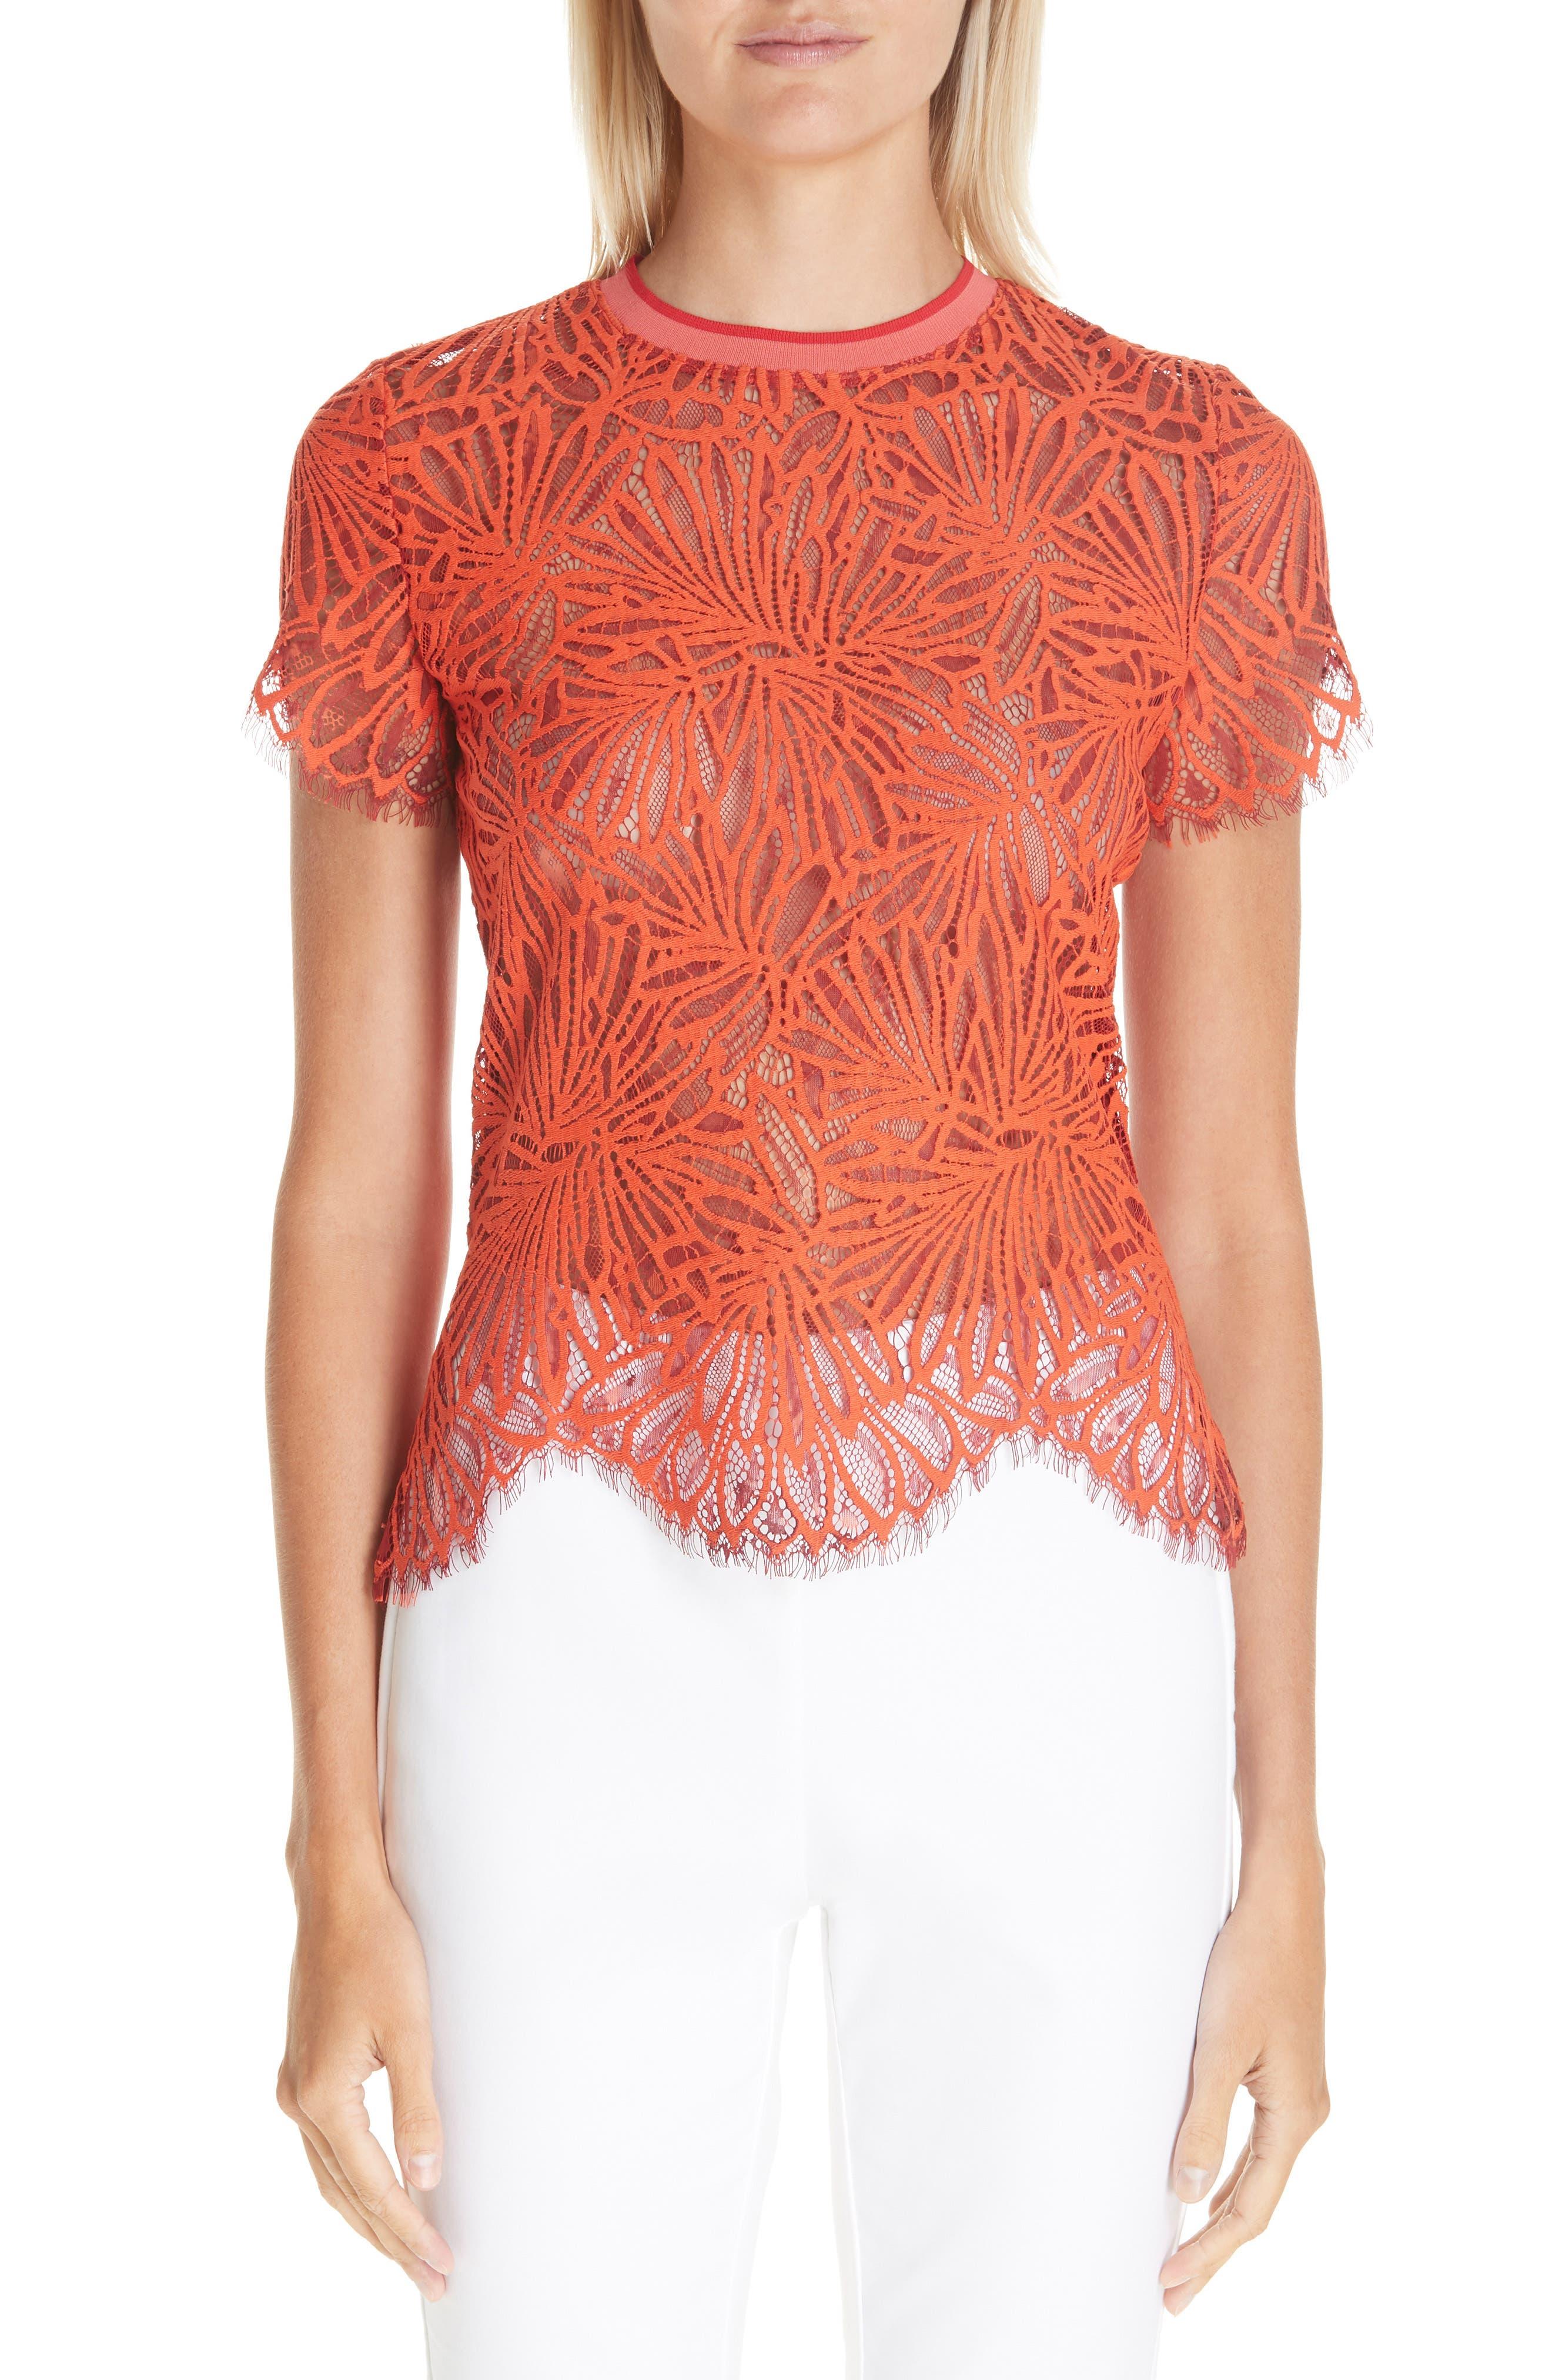 PROENZA SCHOULER Scalloped Stretch Lace Top, Main, color, TANGERINE